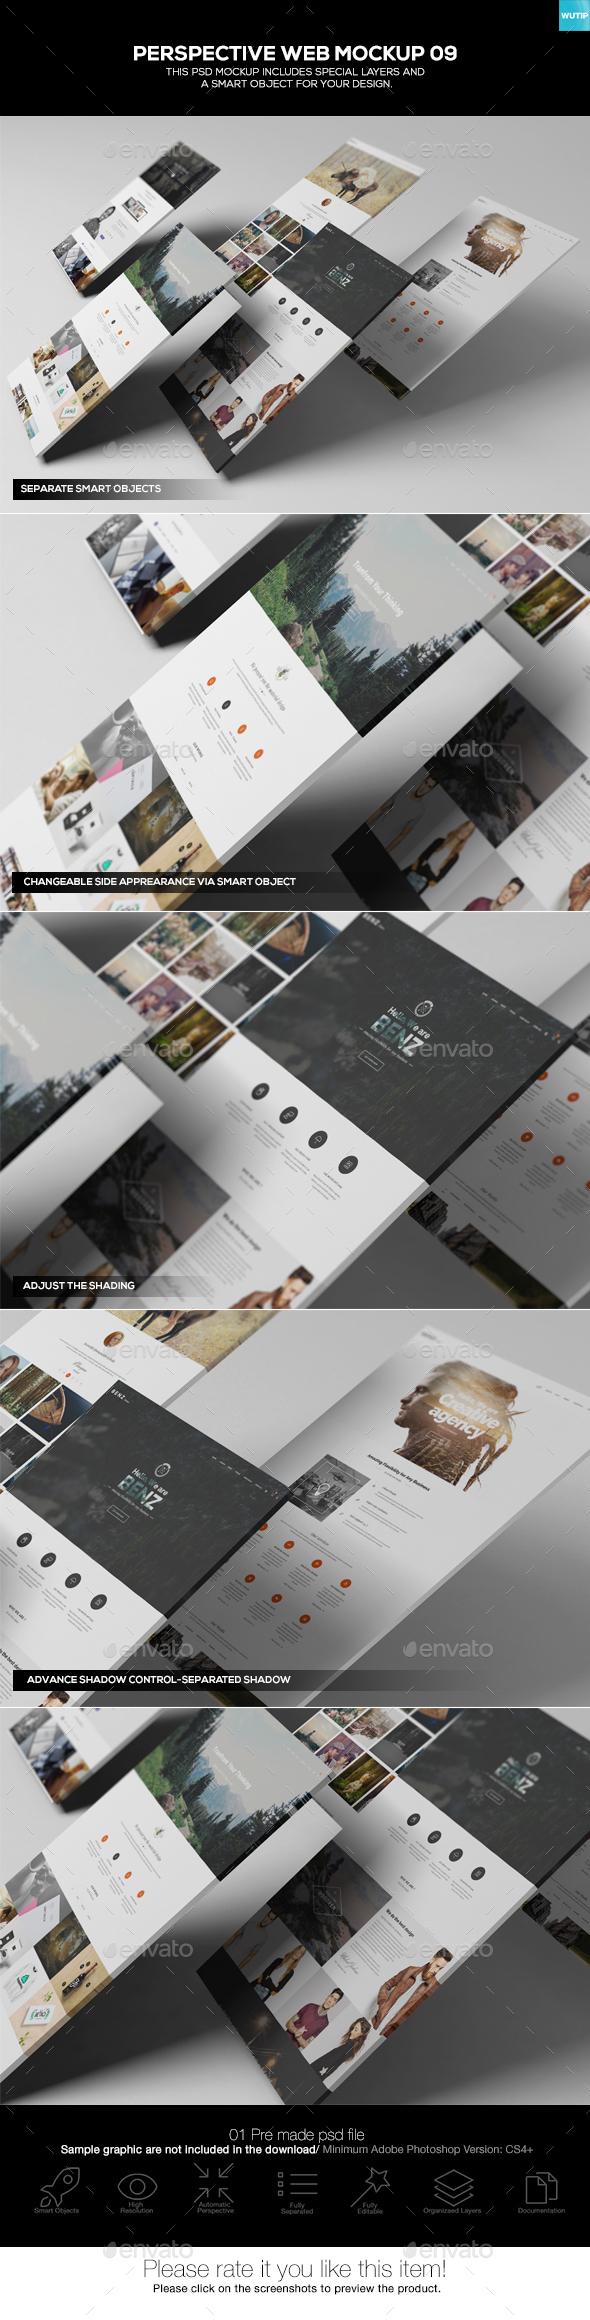 Perspective Web Mockup 09 - Website Displays